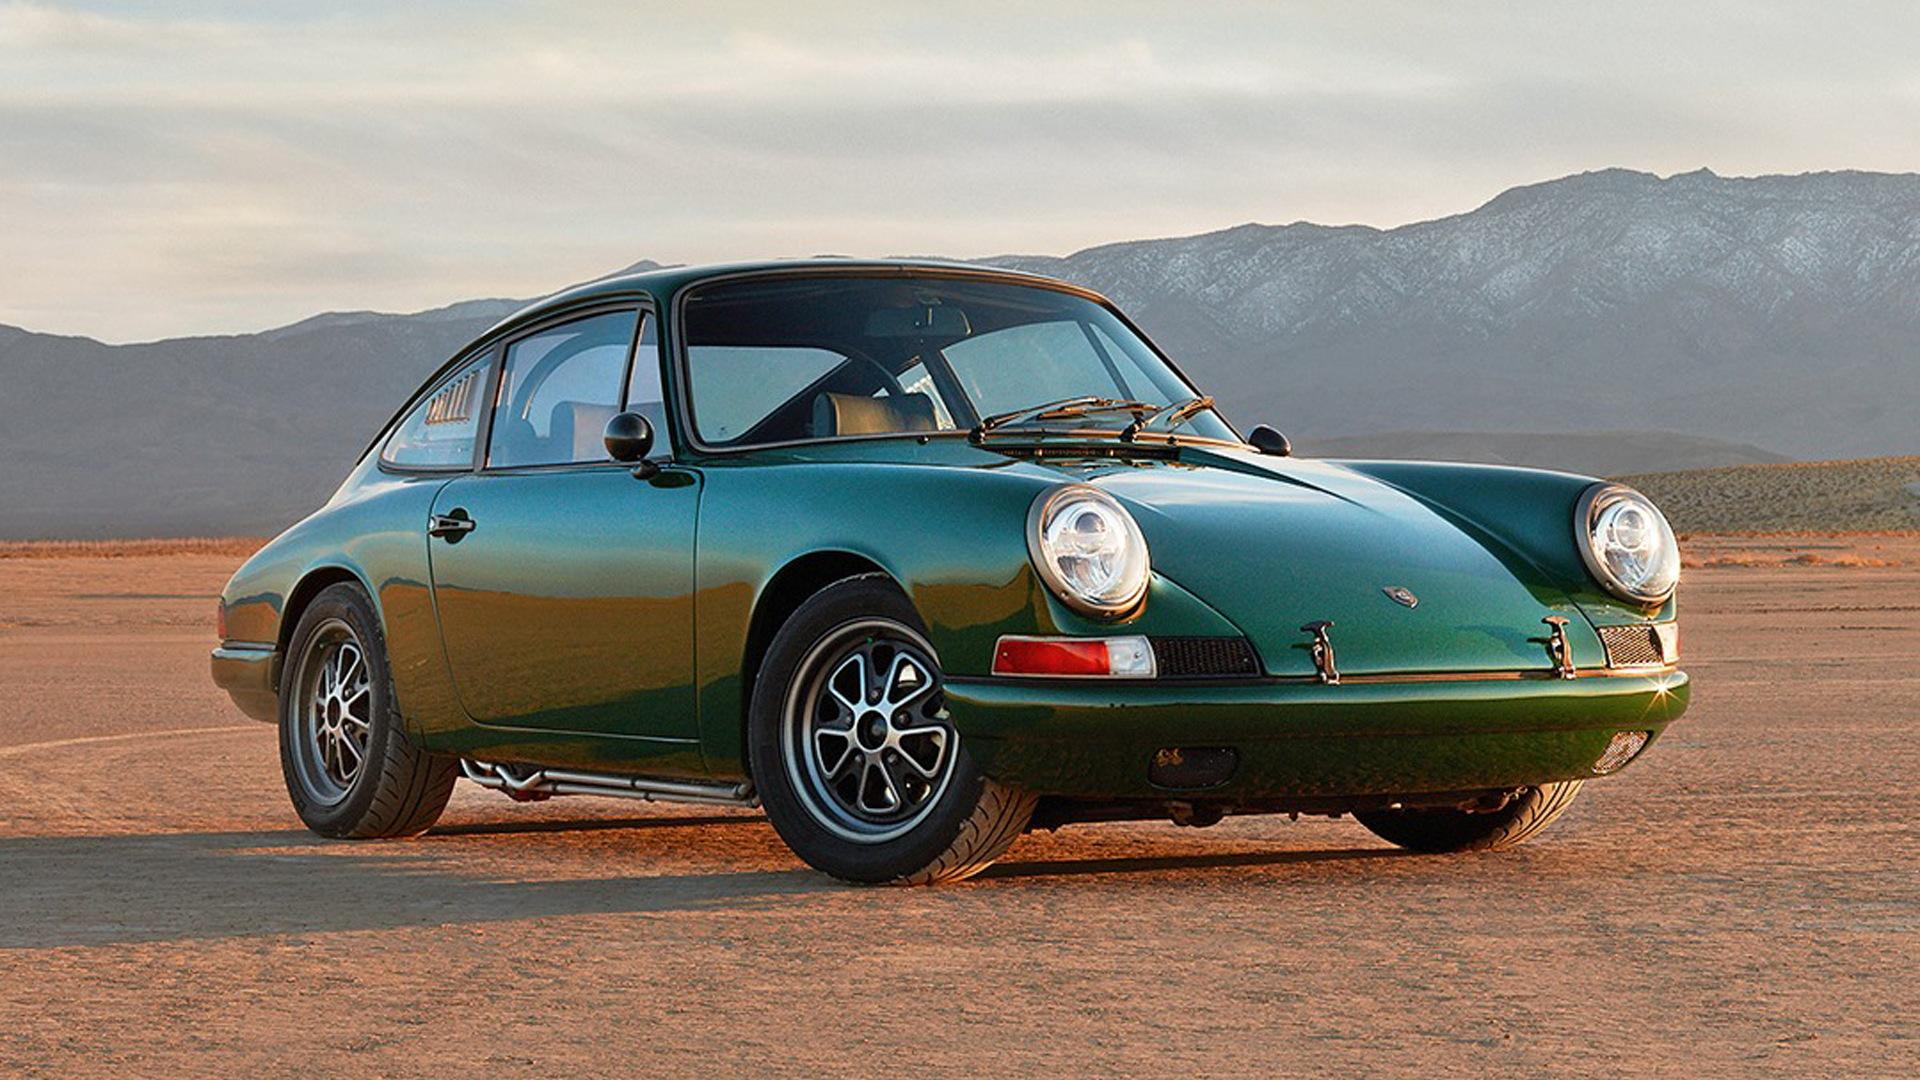 Porsche 912 electric conversion by Zelectric